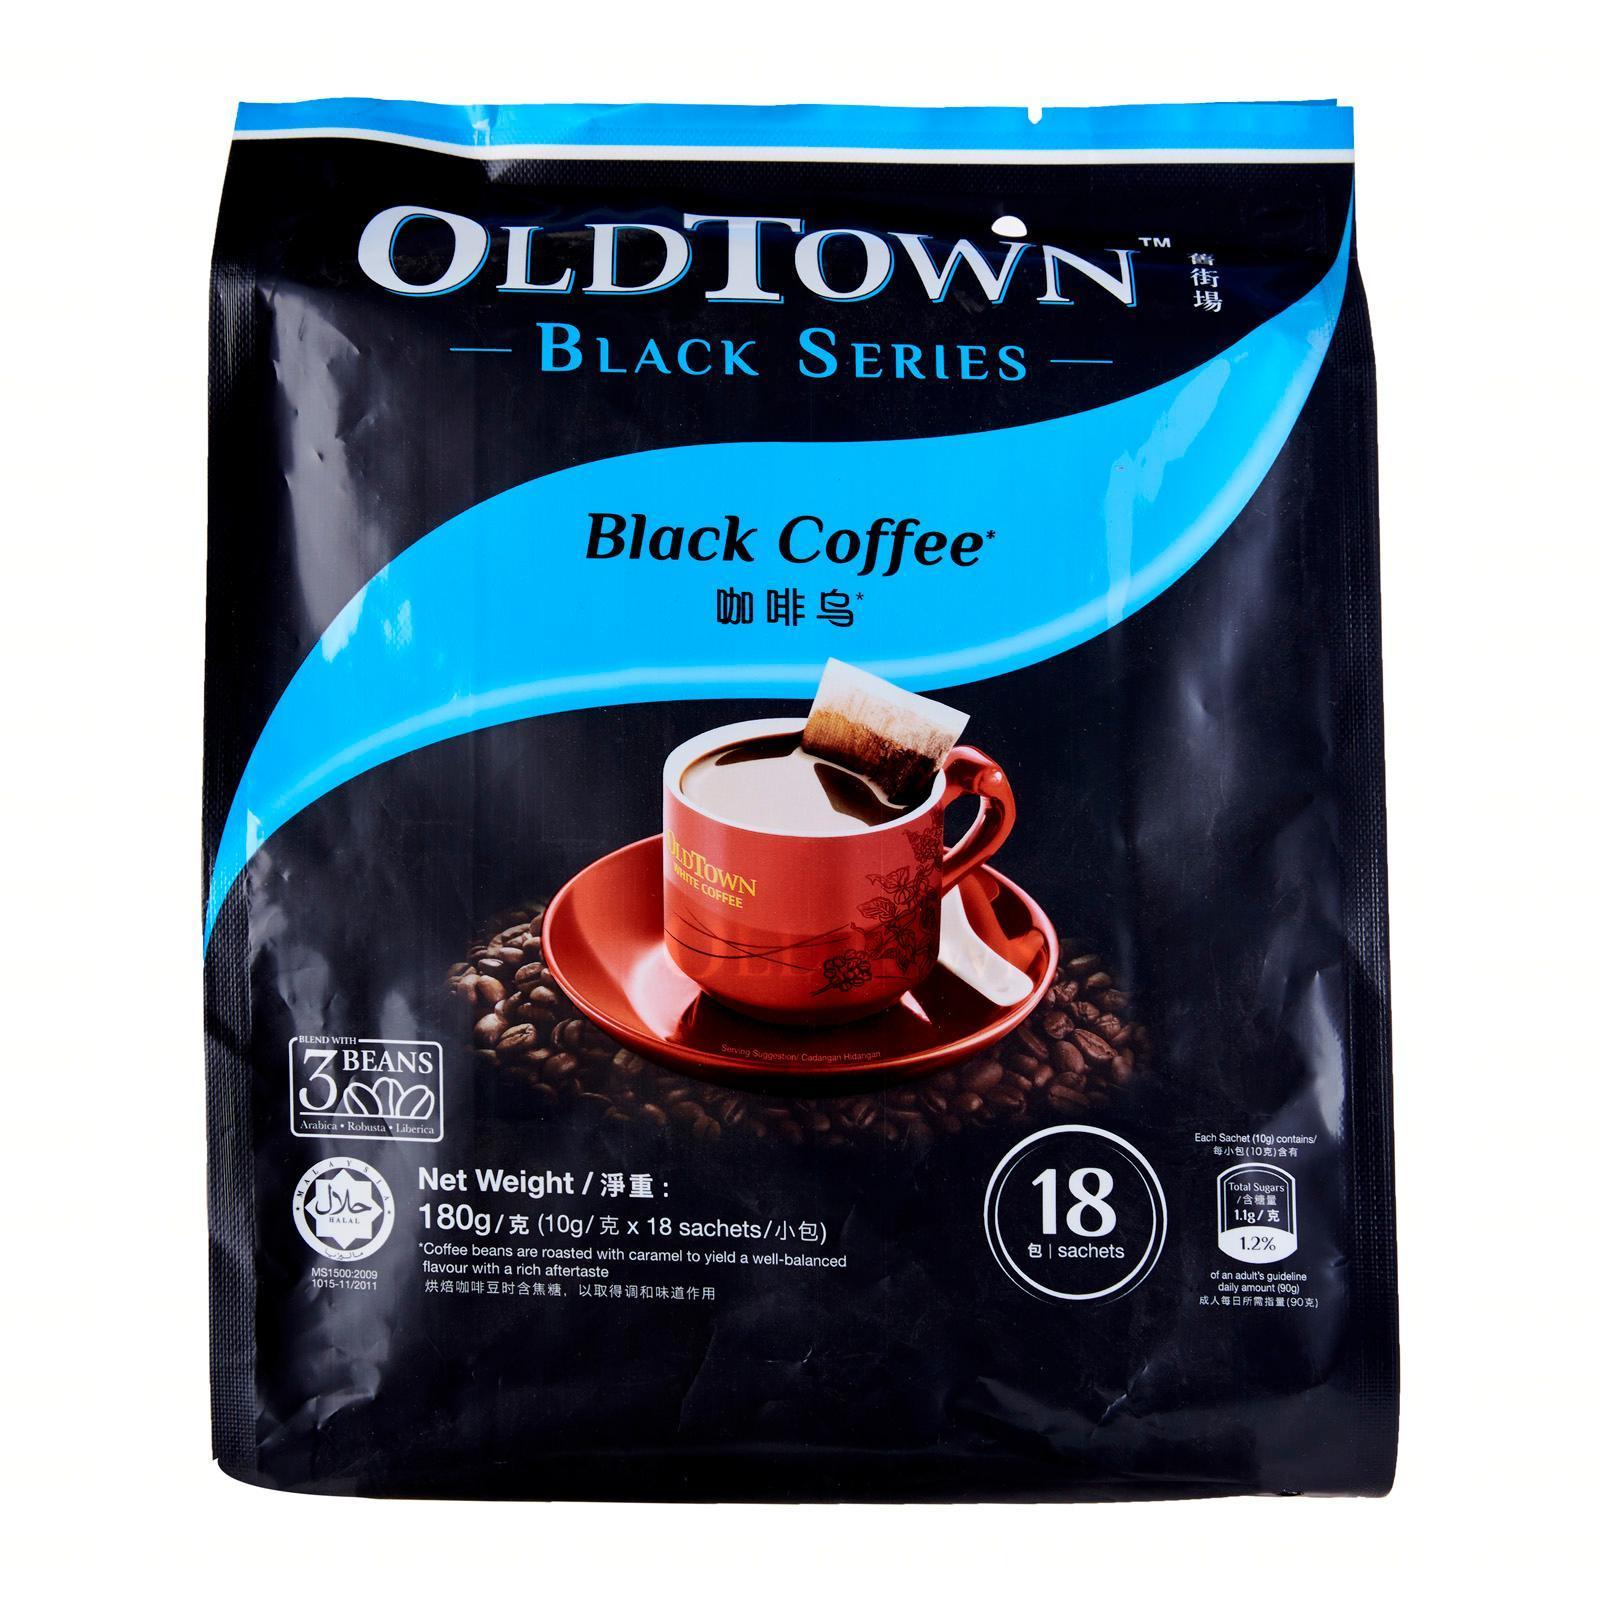 Old Town White Coffee Black Series Black Coffee